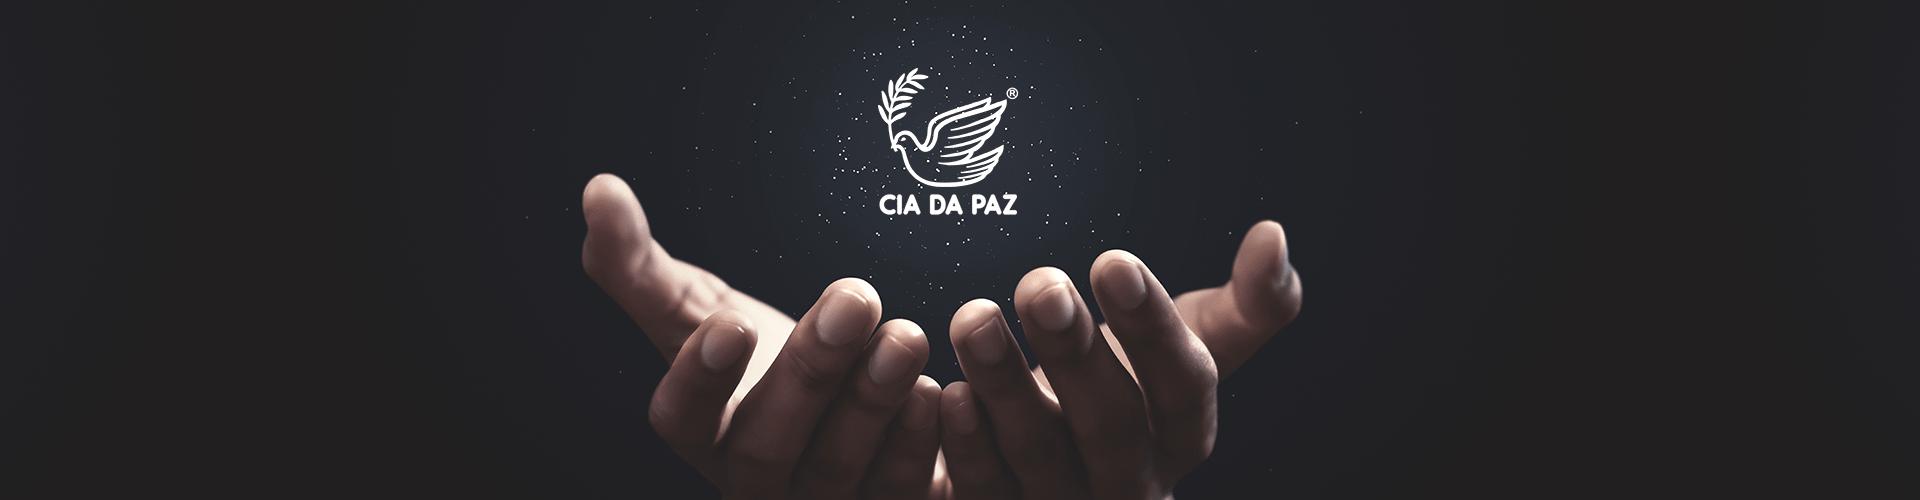 CIA DA PAZ